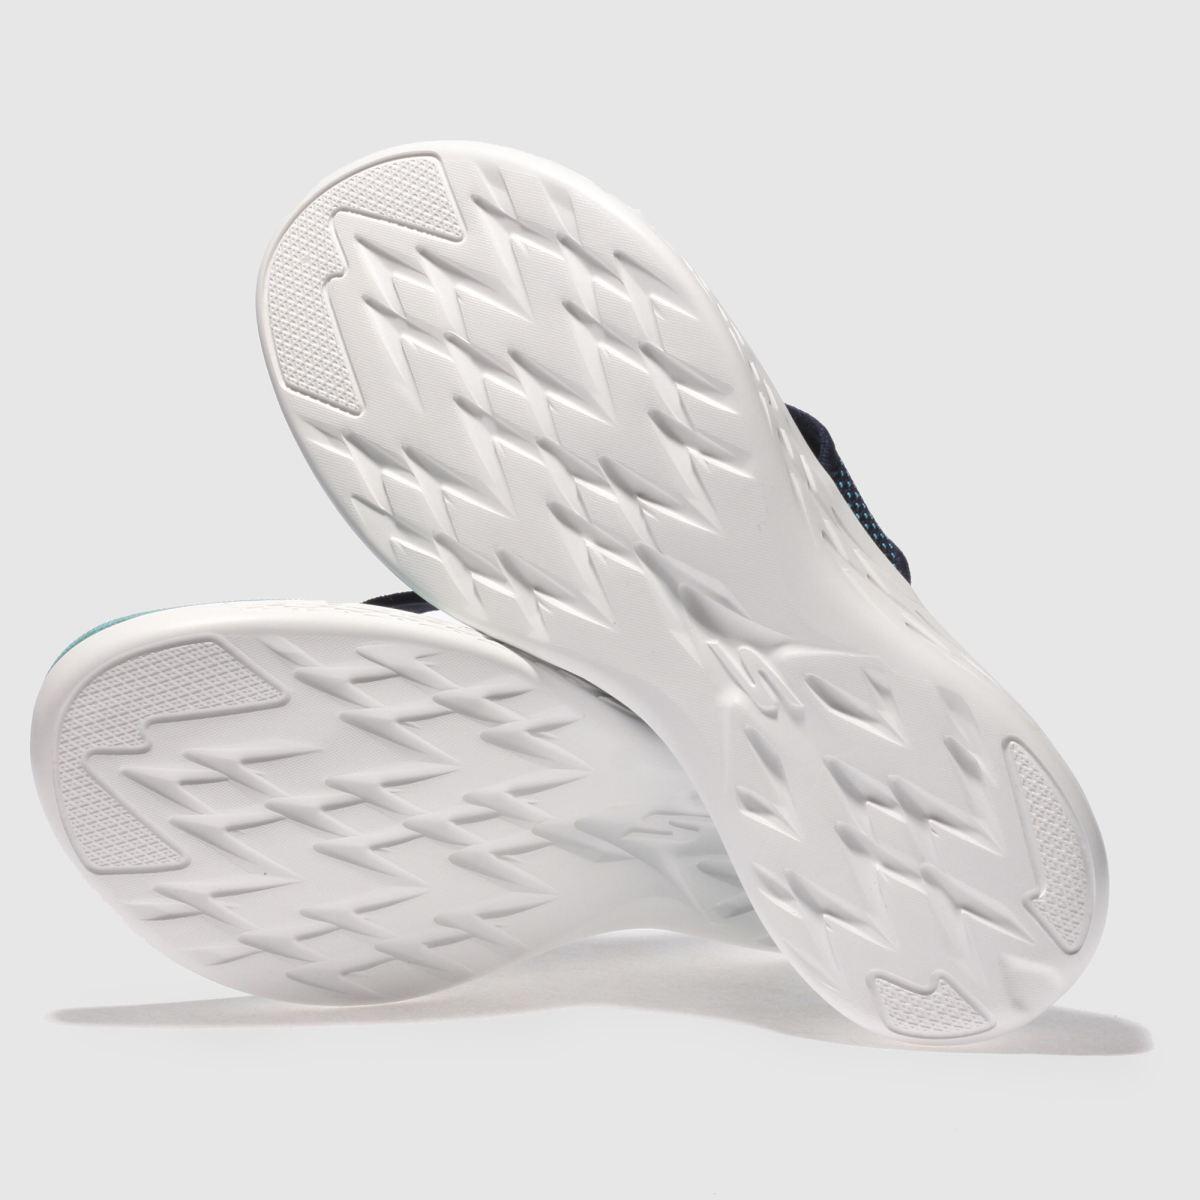 Damen schuh Marineblau skechers On The Go 600 Sandalen | schuh Damen Gute Qualität beliebte Schuhe f6c6da